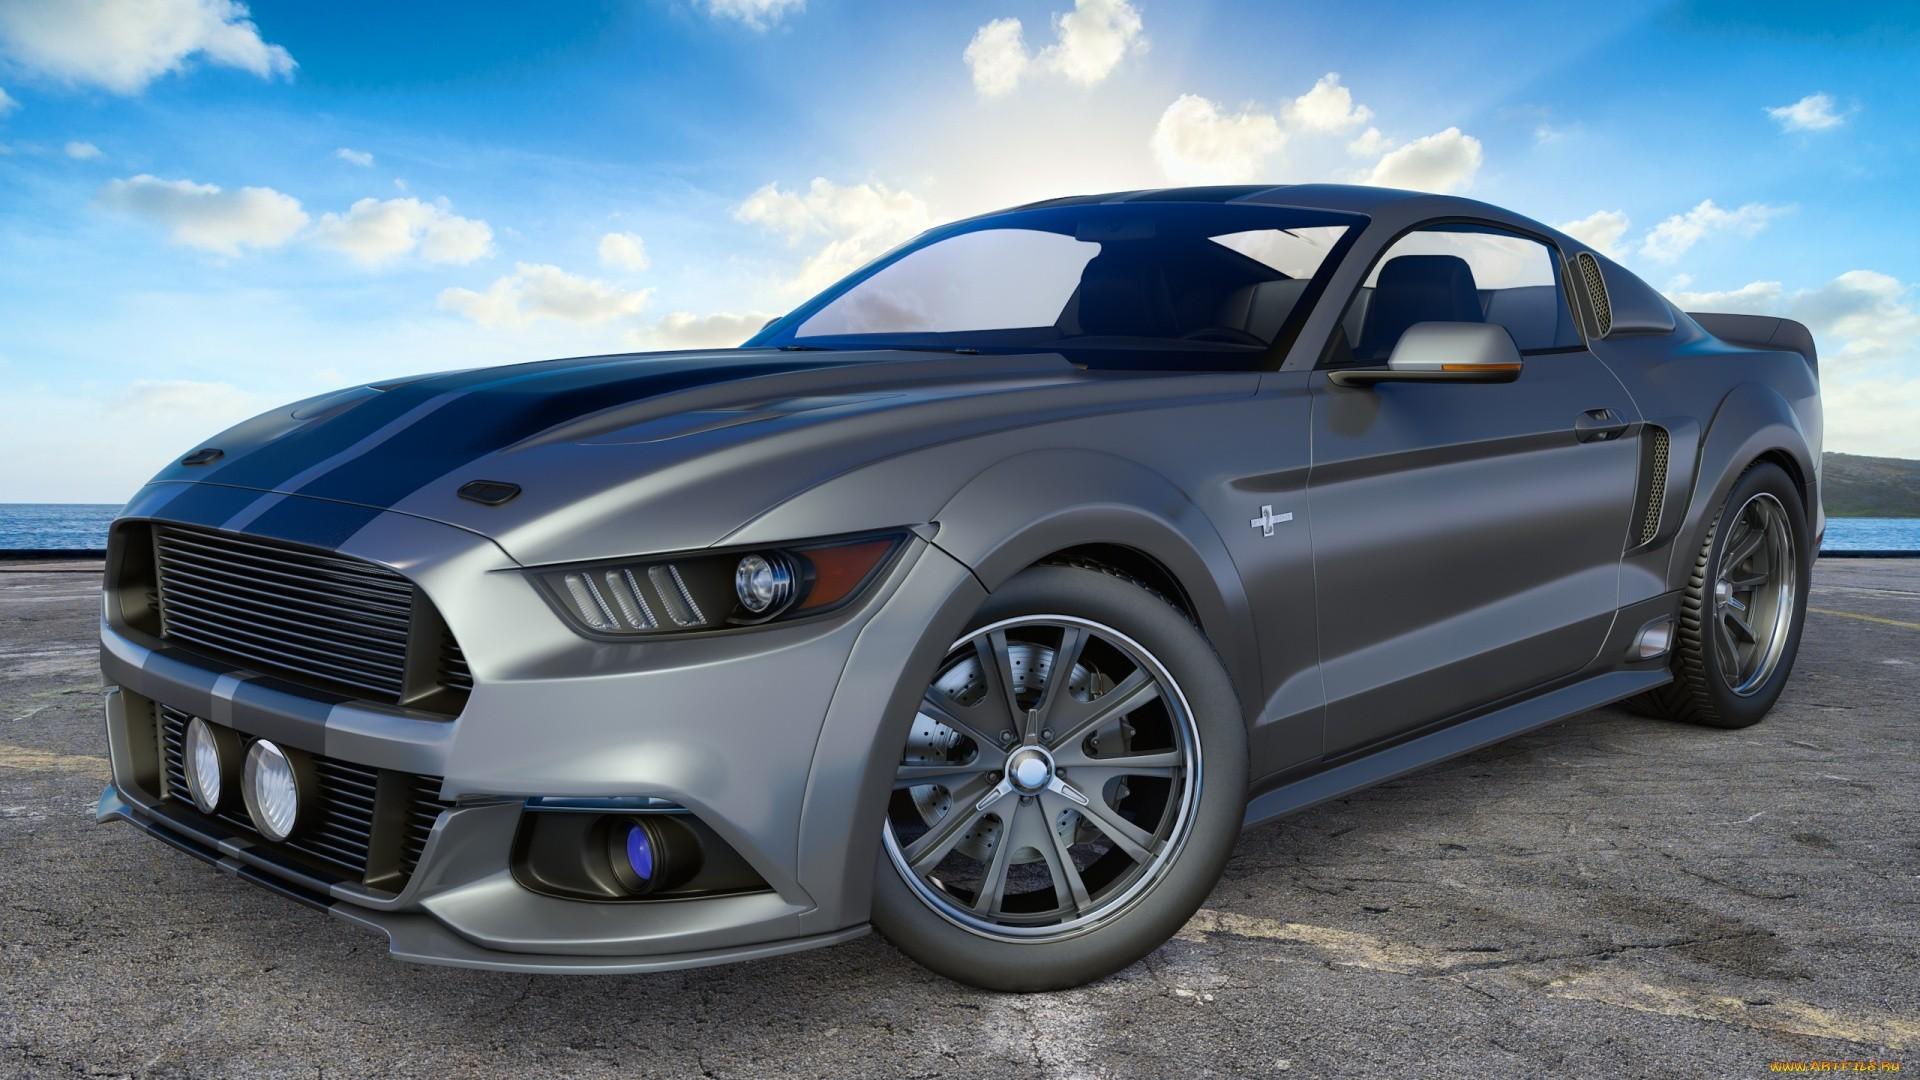 Mustang Wallpaper Image